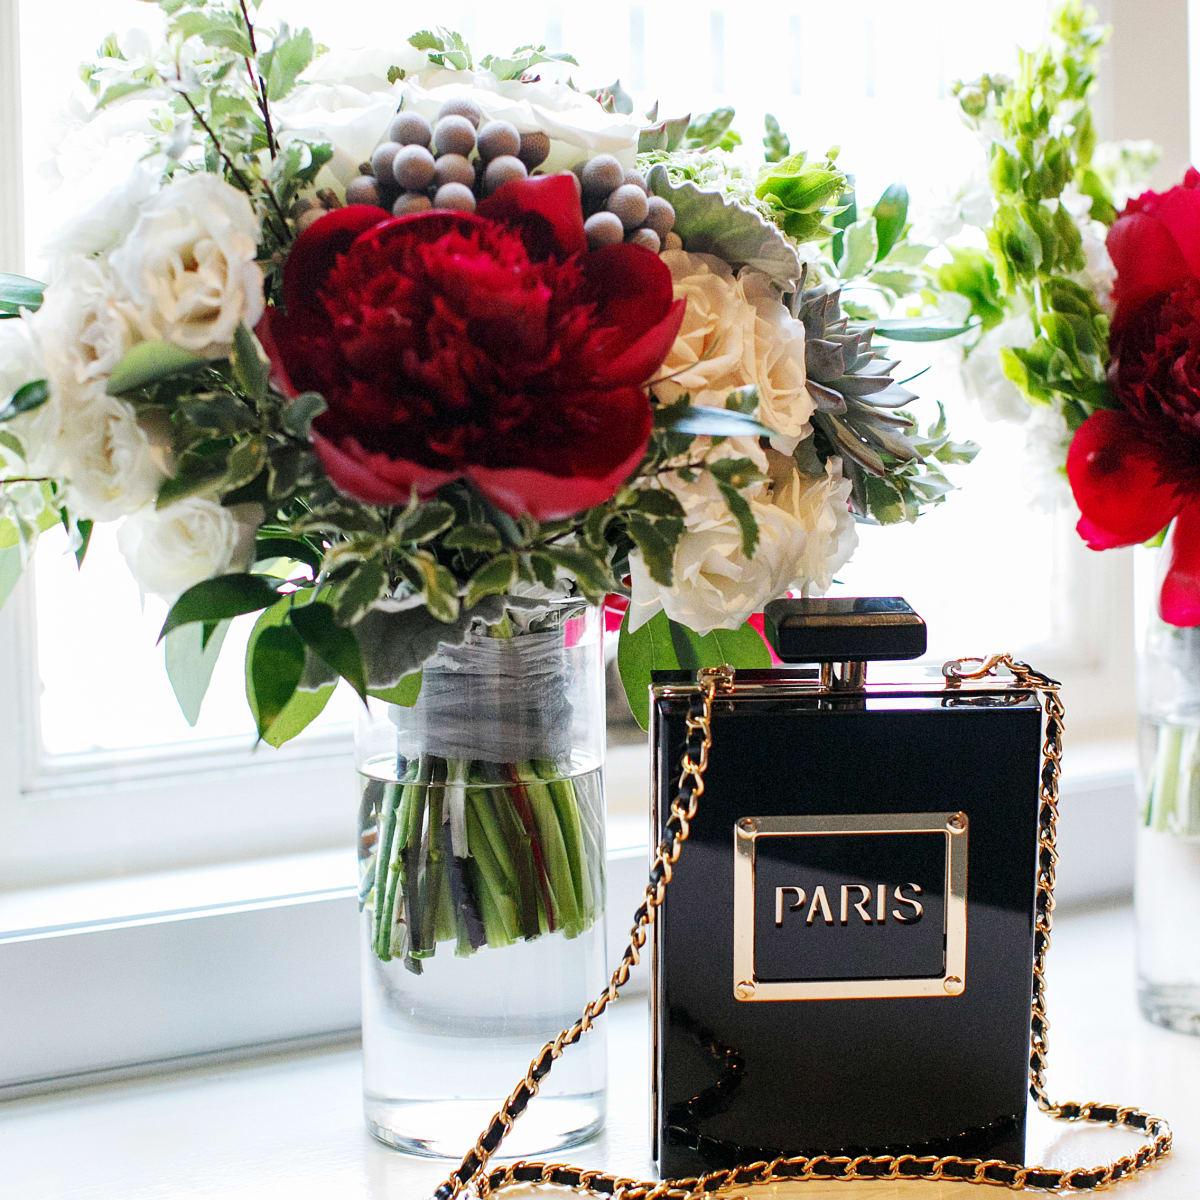 Womack Wedding, Paris bottle